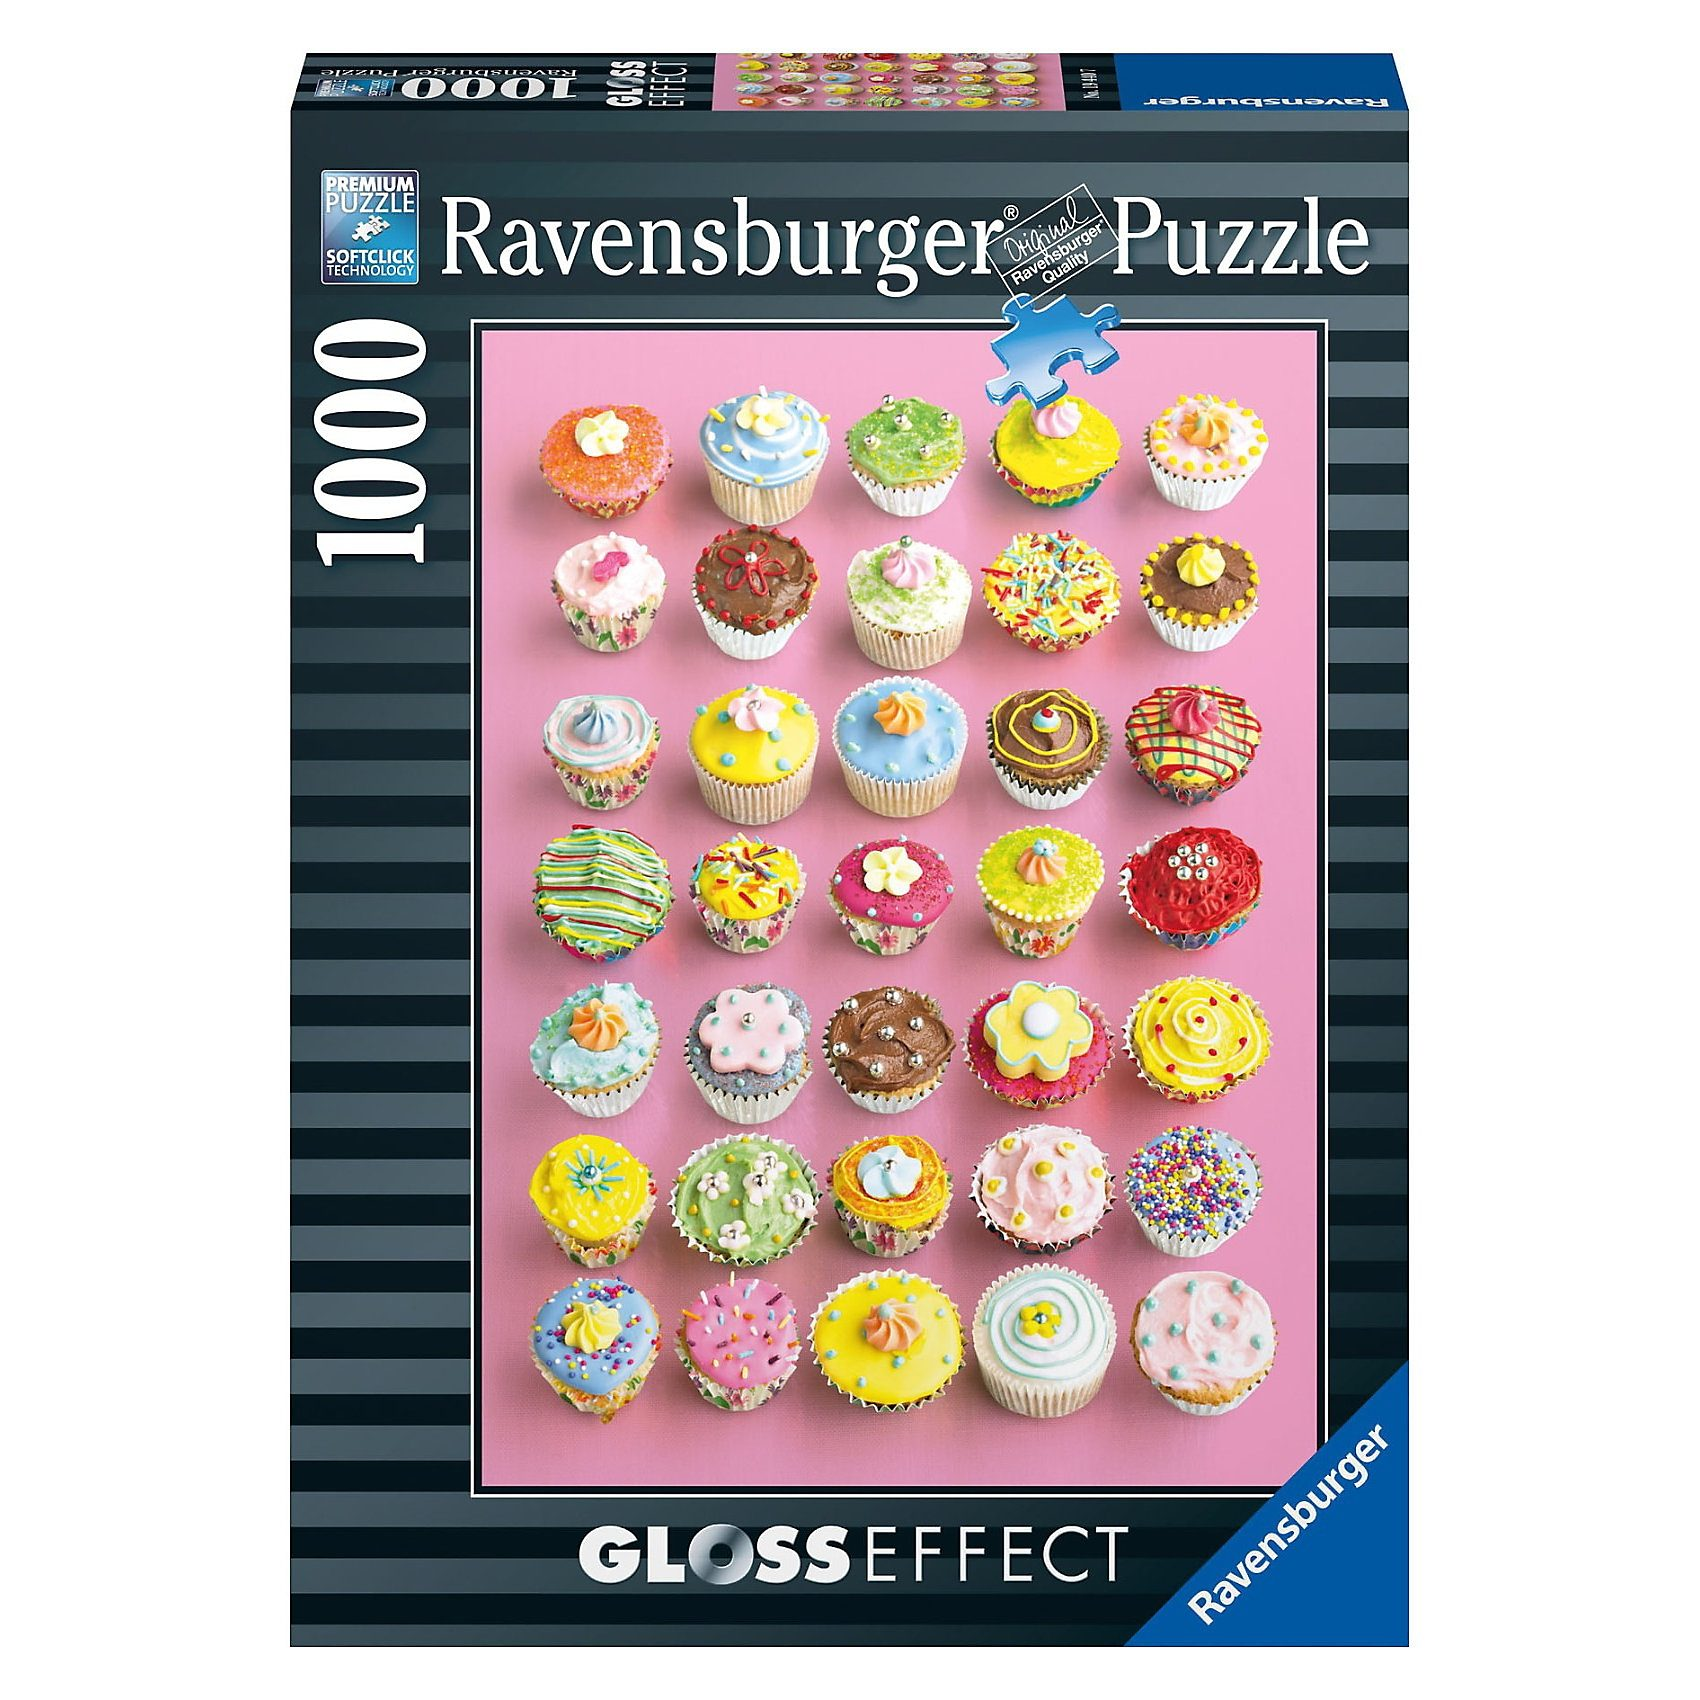 Ravensburger Puzzle Bunte Cupcakes 1000 Teile